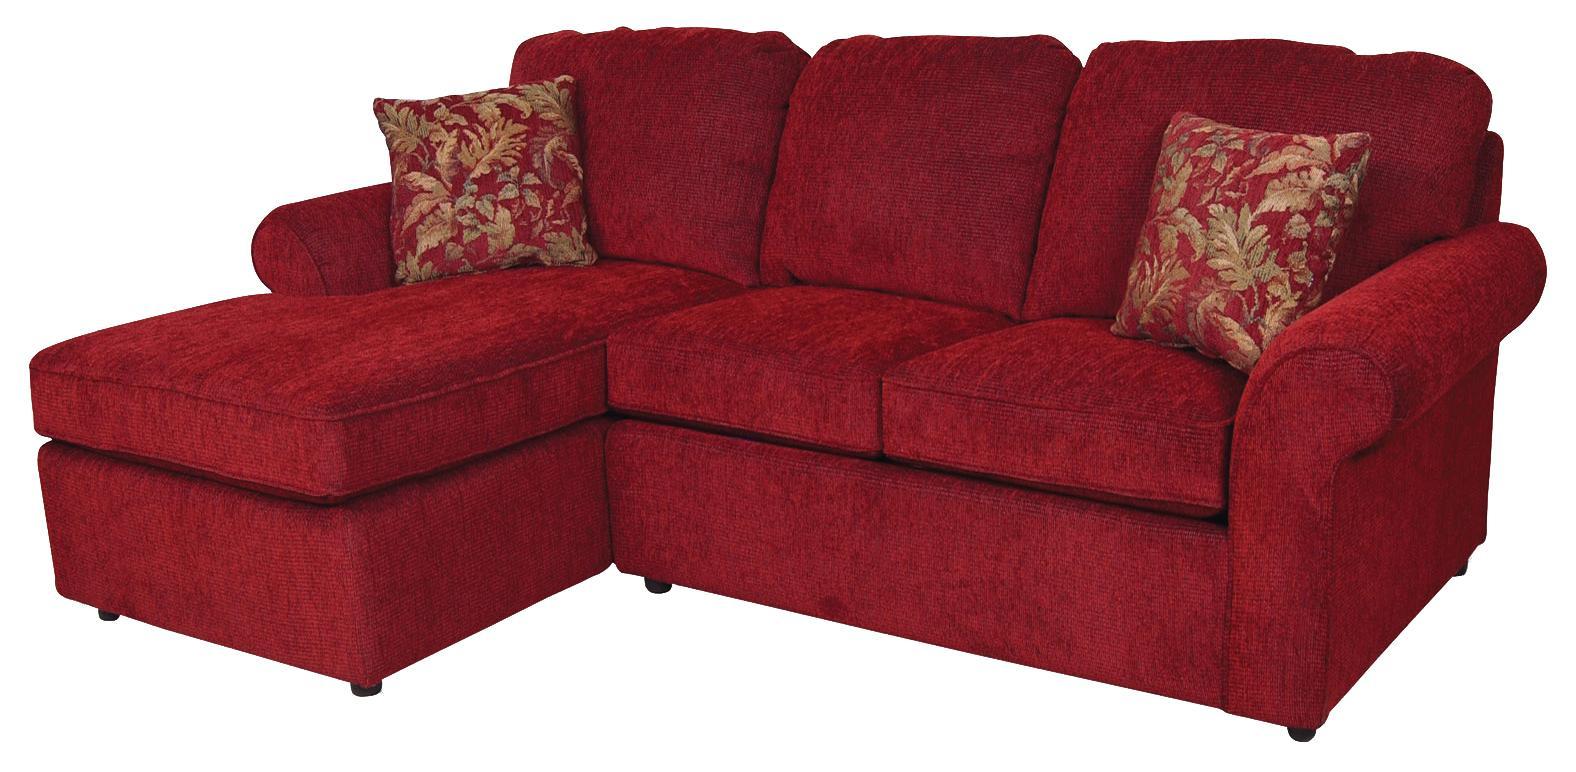 3 sided sectional sofa sofas phoenix arizona england malibu seat left side chaise vandrie